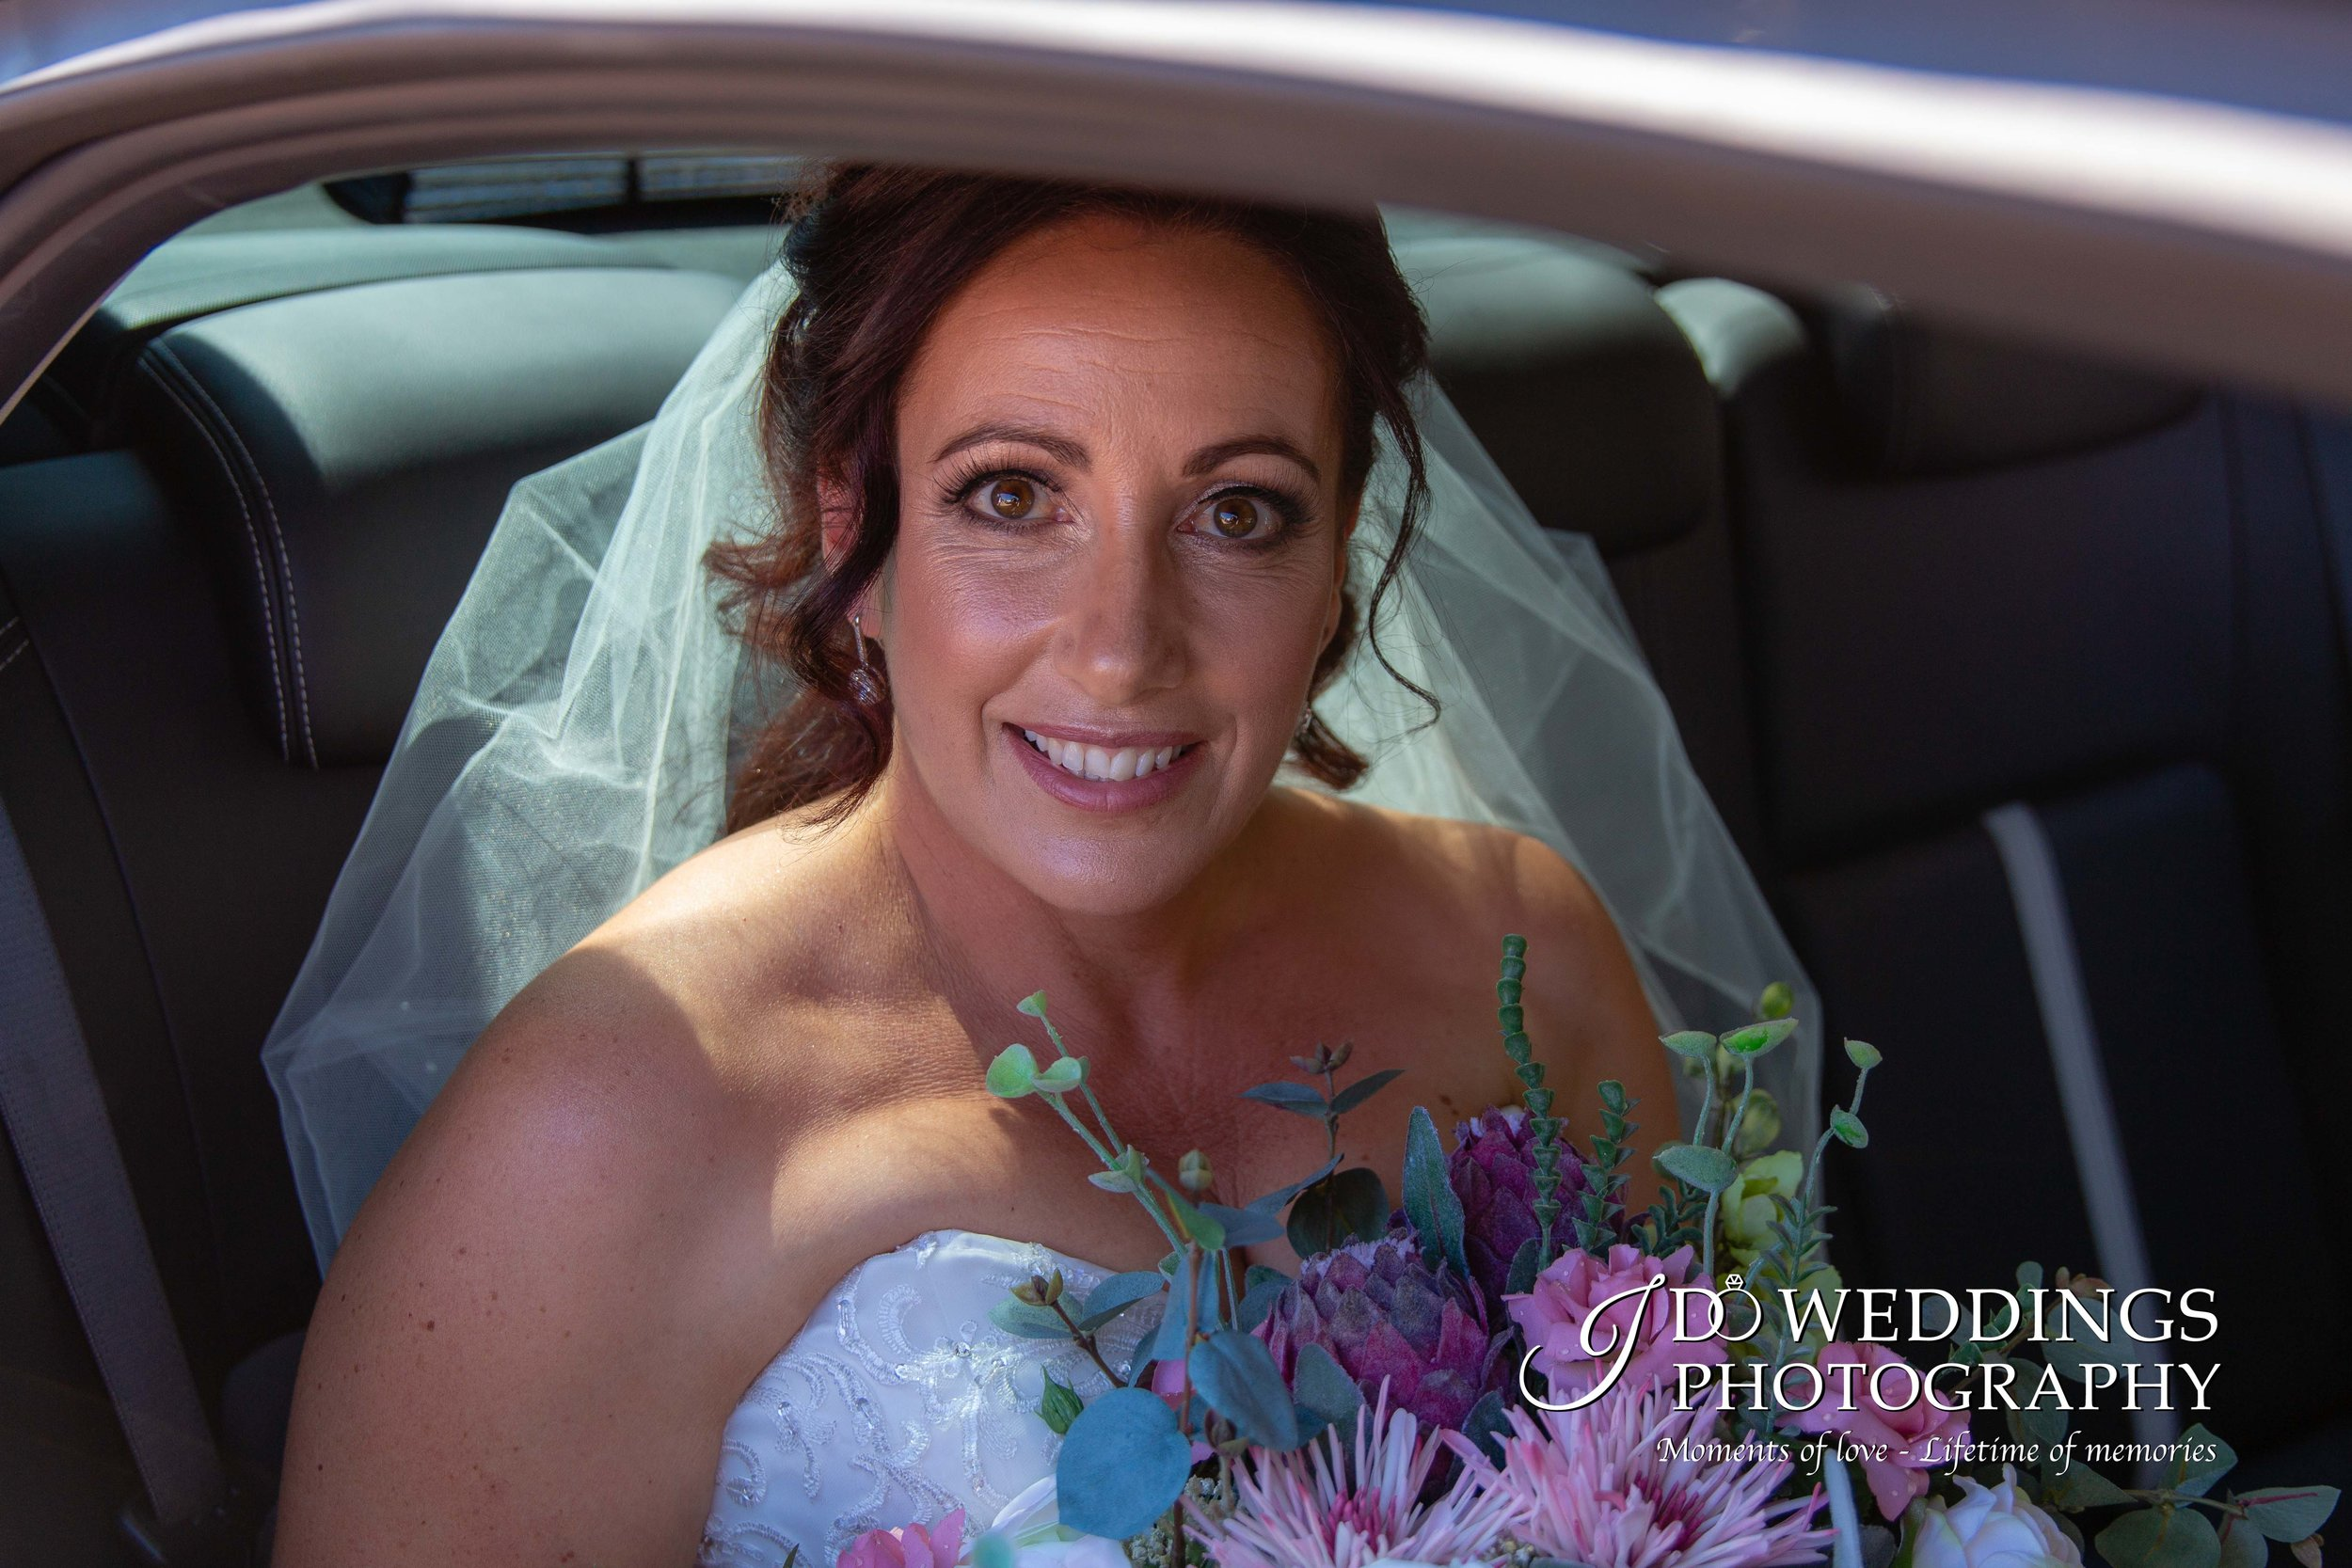 wedding images5.jpg